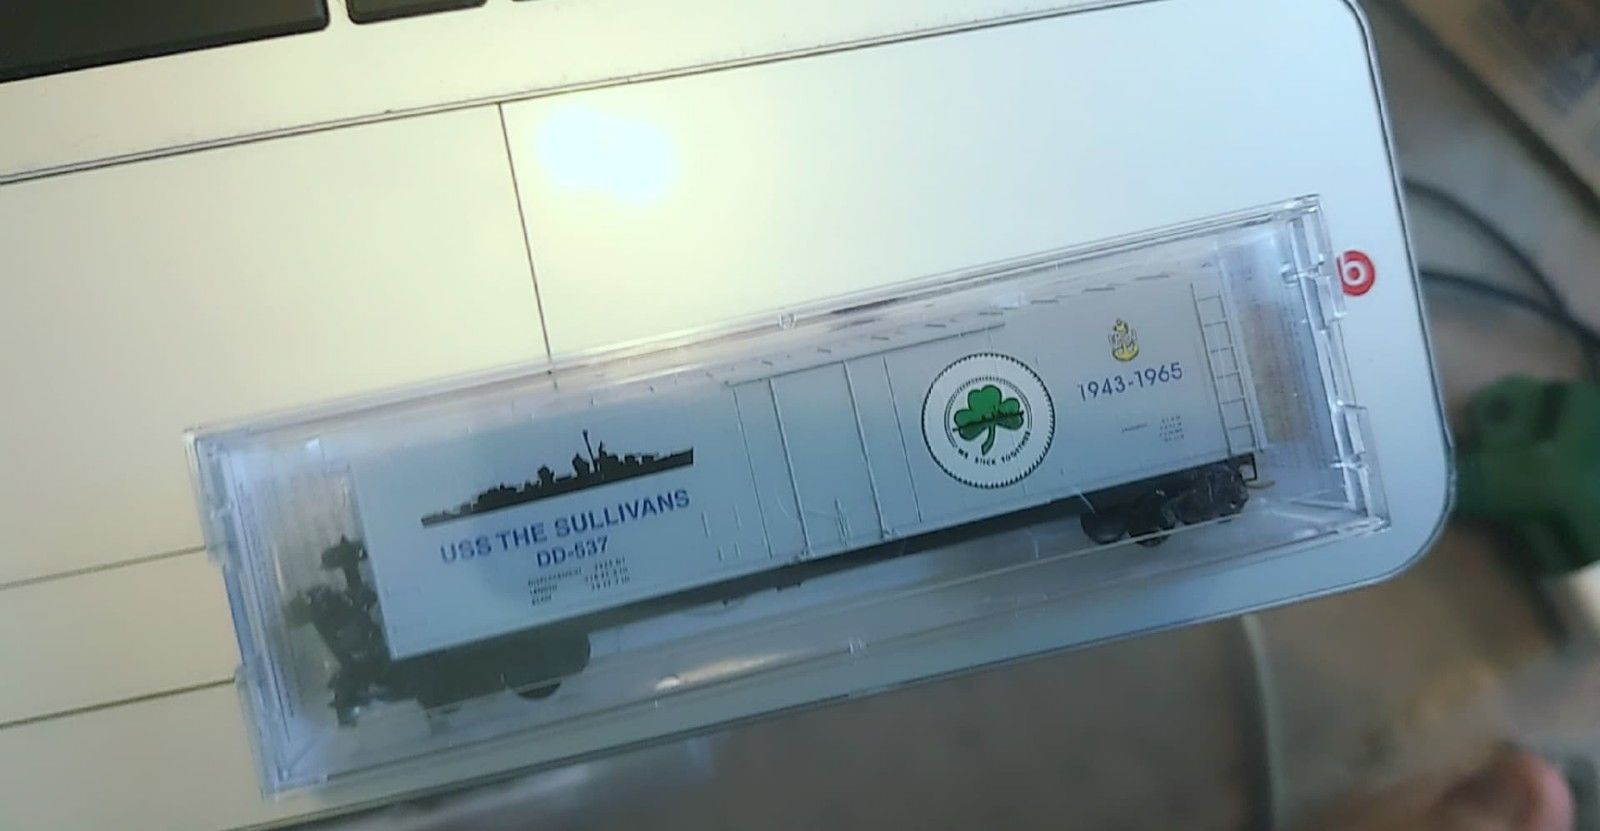 Model Railroads & Trains N Scale Micro-trains 038 00 406 Uss Gilbert Islands Navy Series #6 Boxcar New In Box